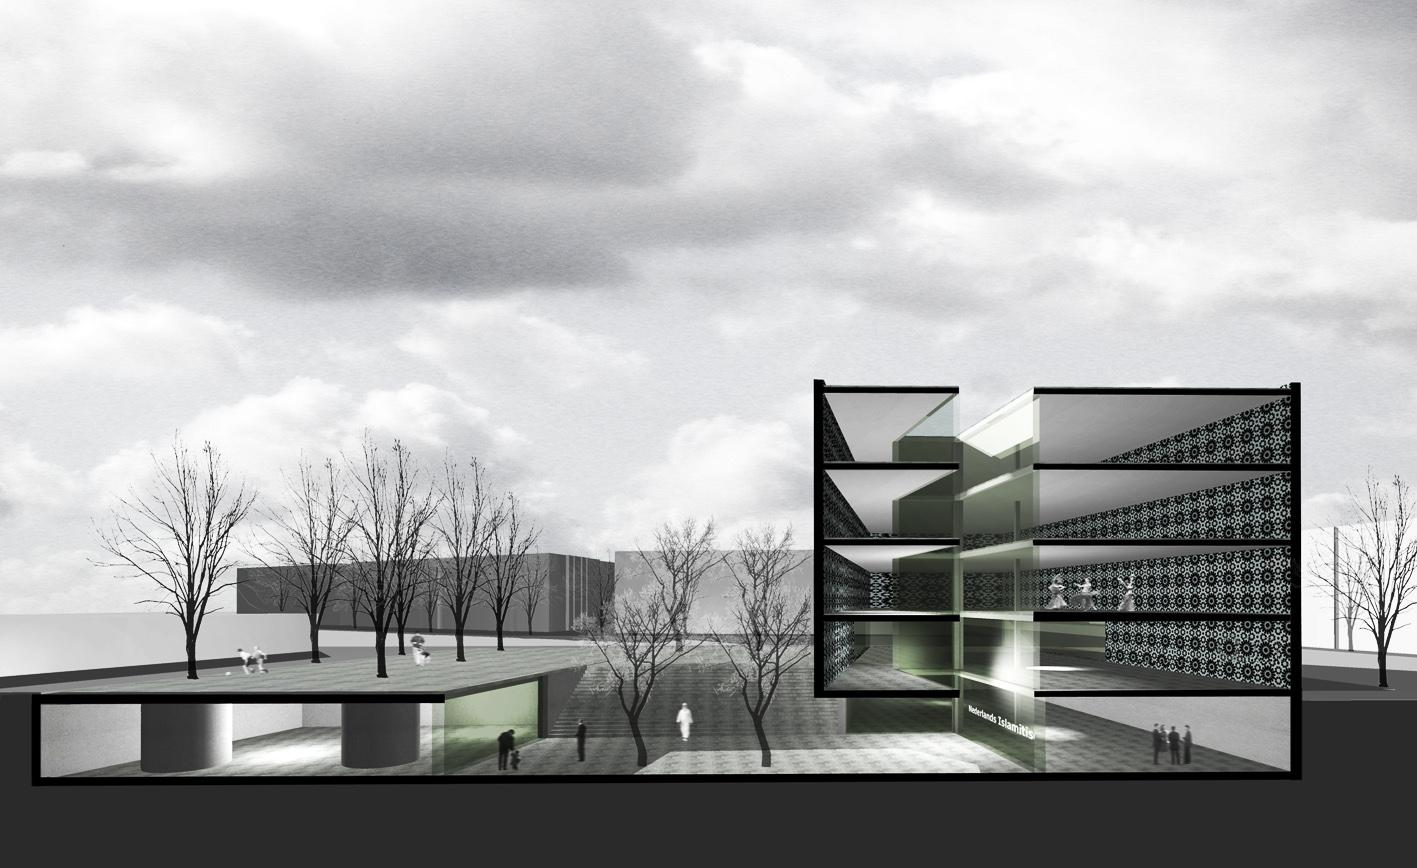 Nederlands Islamitisch Cultureel Instituut Amsterdam mr visserplein Atelier PUUUR prix de rome doorsnede